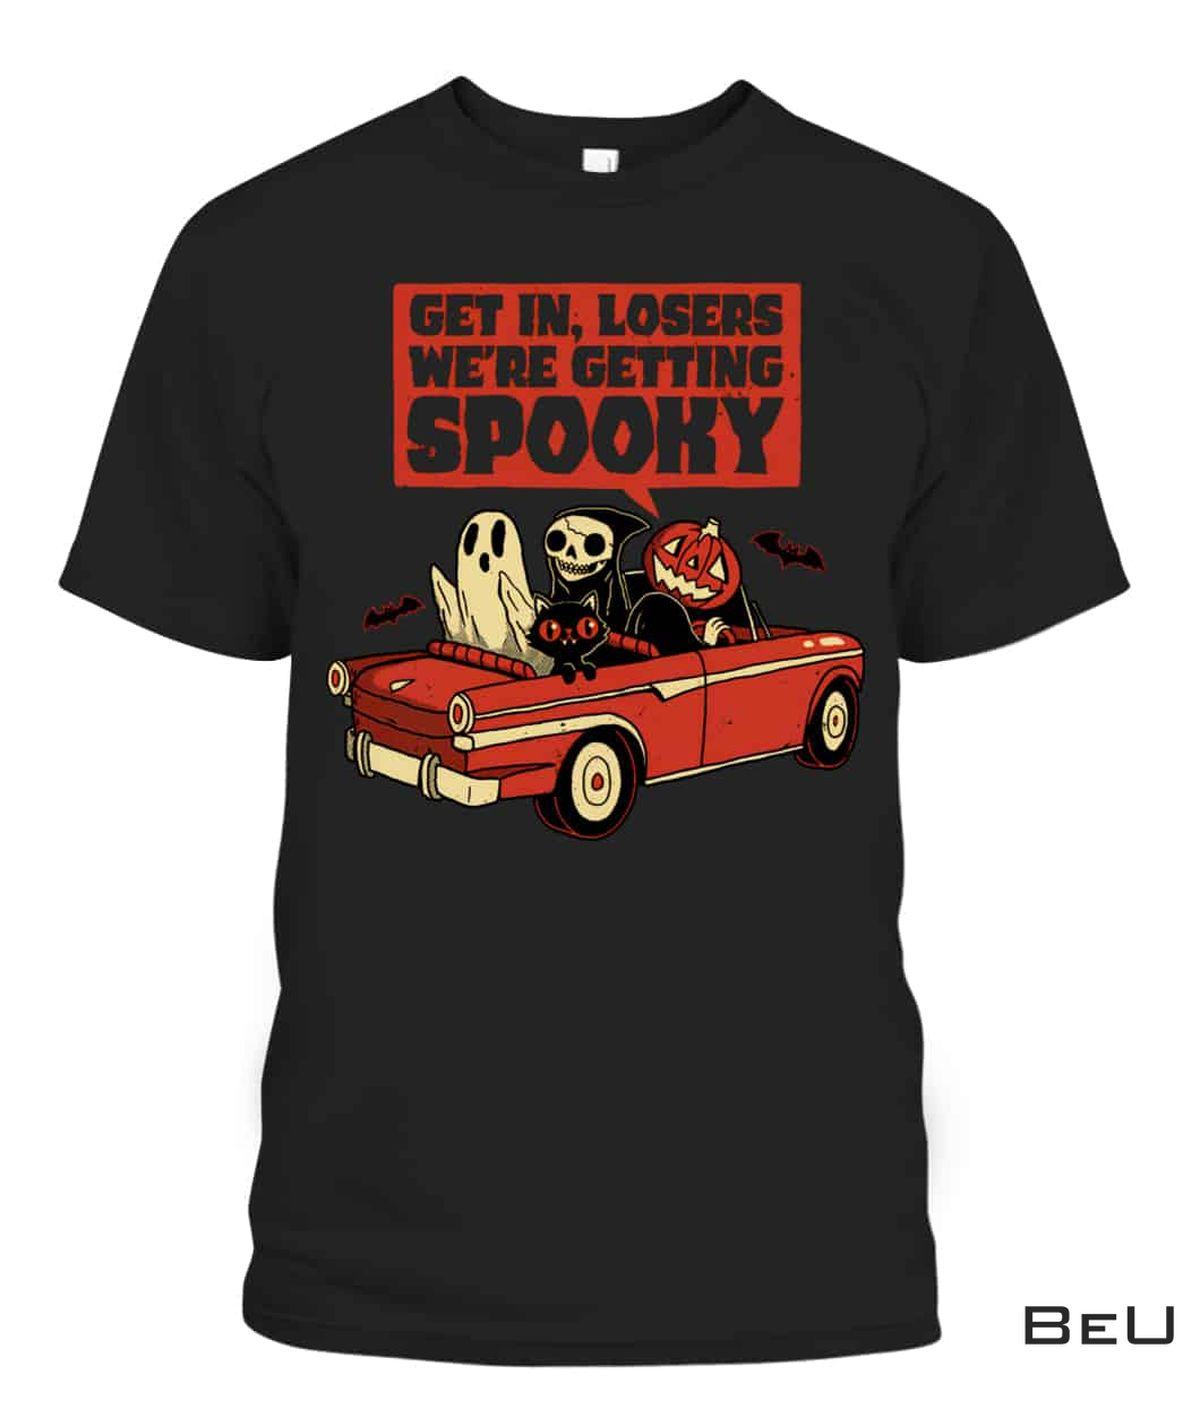 Get In Loser We're Getting Spoonky Shirt